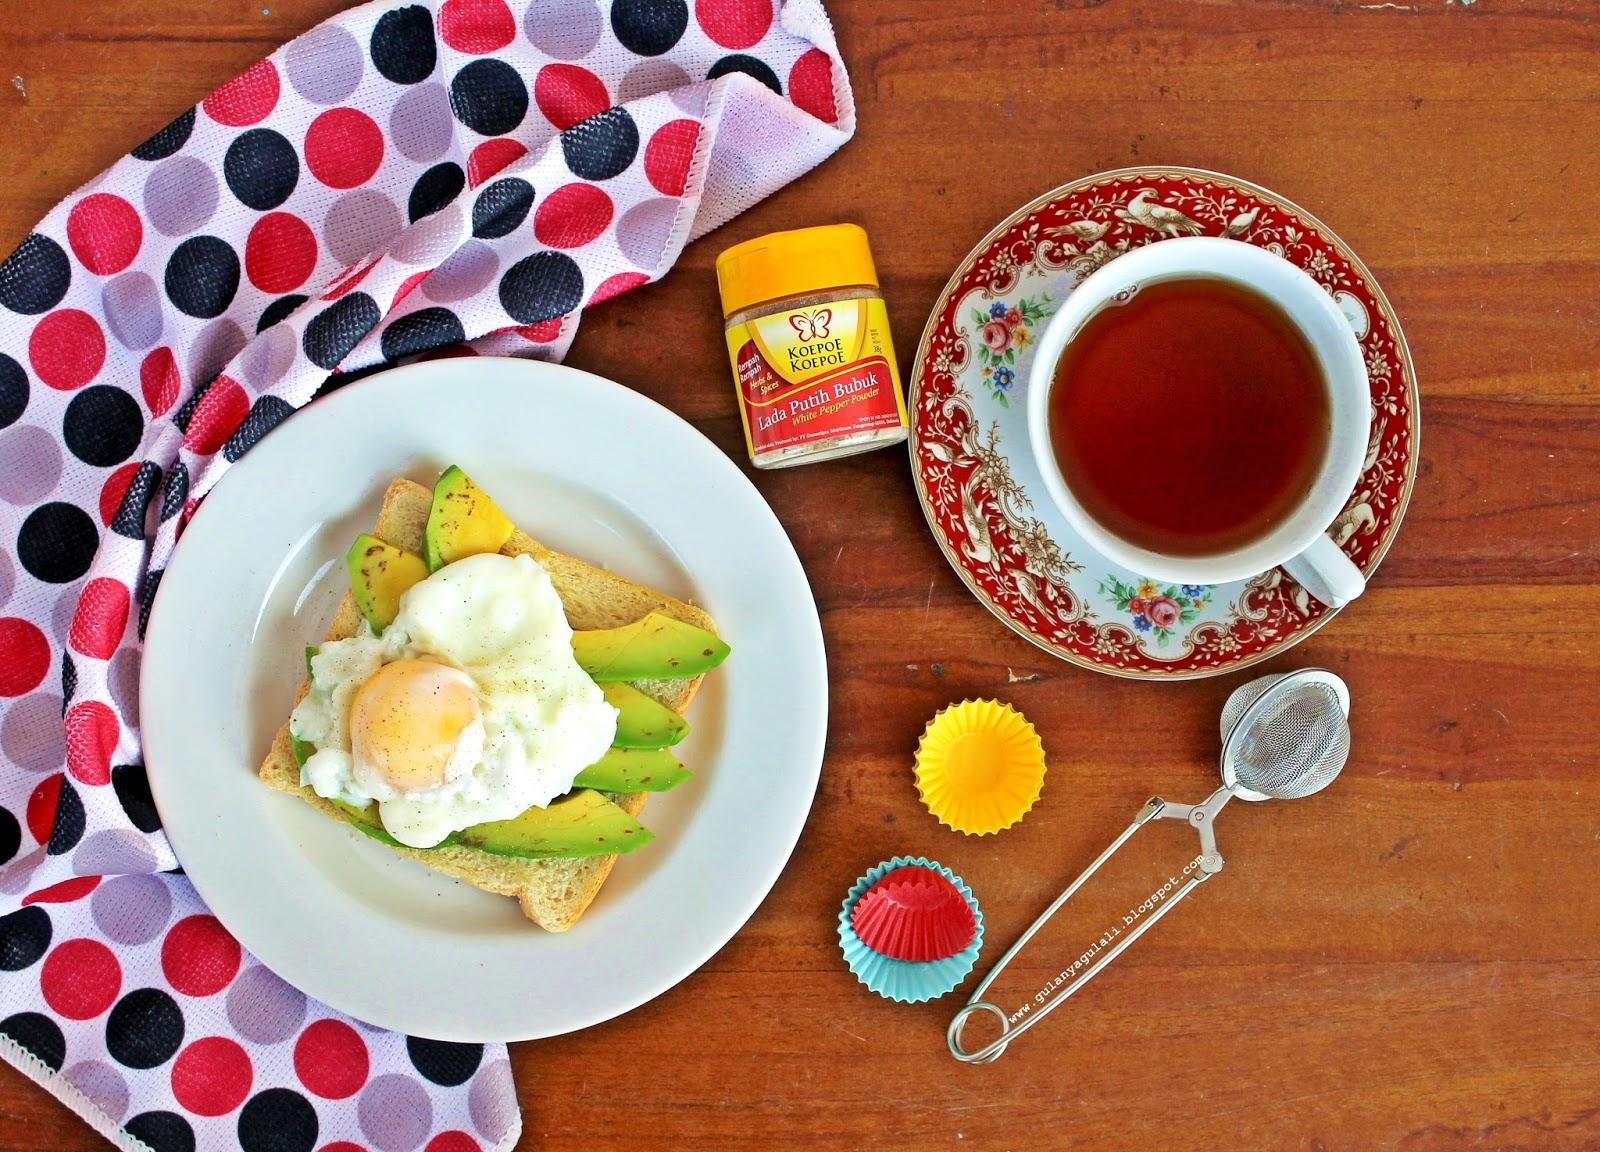 Menerapkan 6 Cara Ini, Makan Mie Instan Gak Bakal Bikin Kamu Merasa Berdosa Lagi